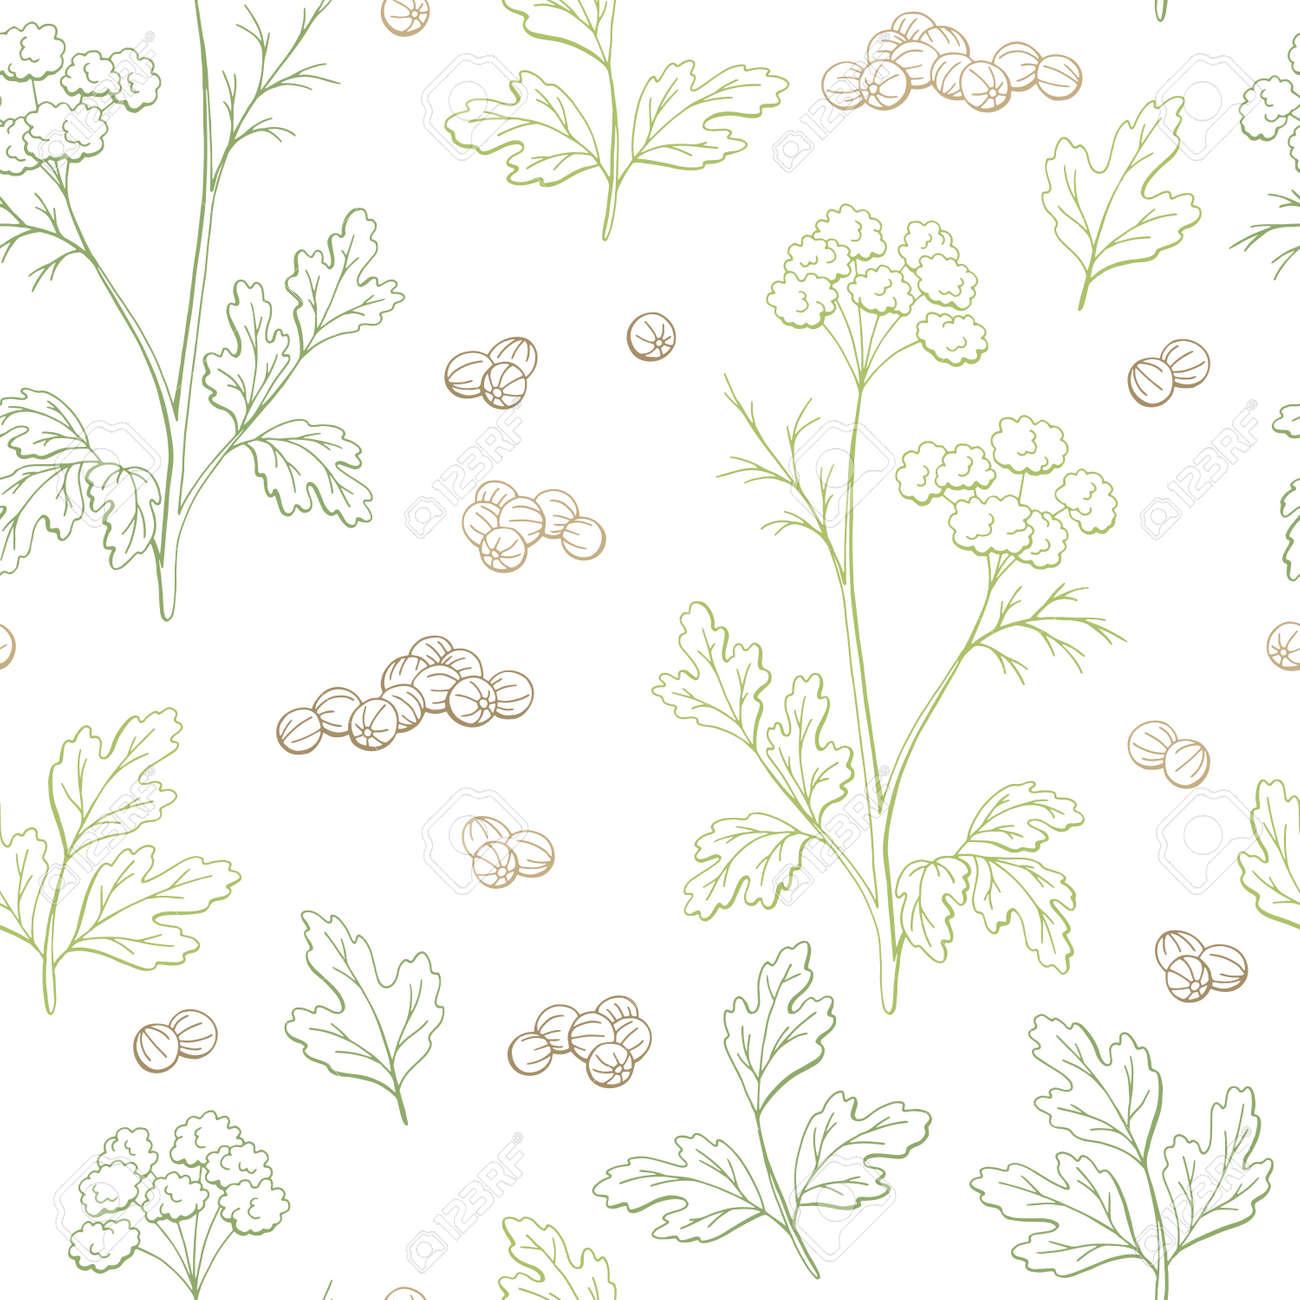 Coriander cilantro plant graphic color seamless pattern background sketch illustration vector - 104772619